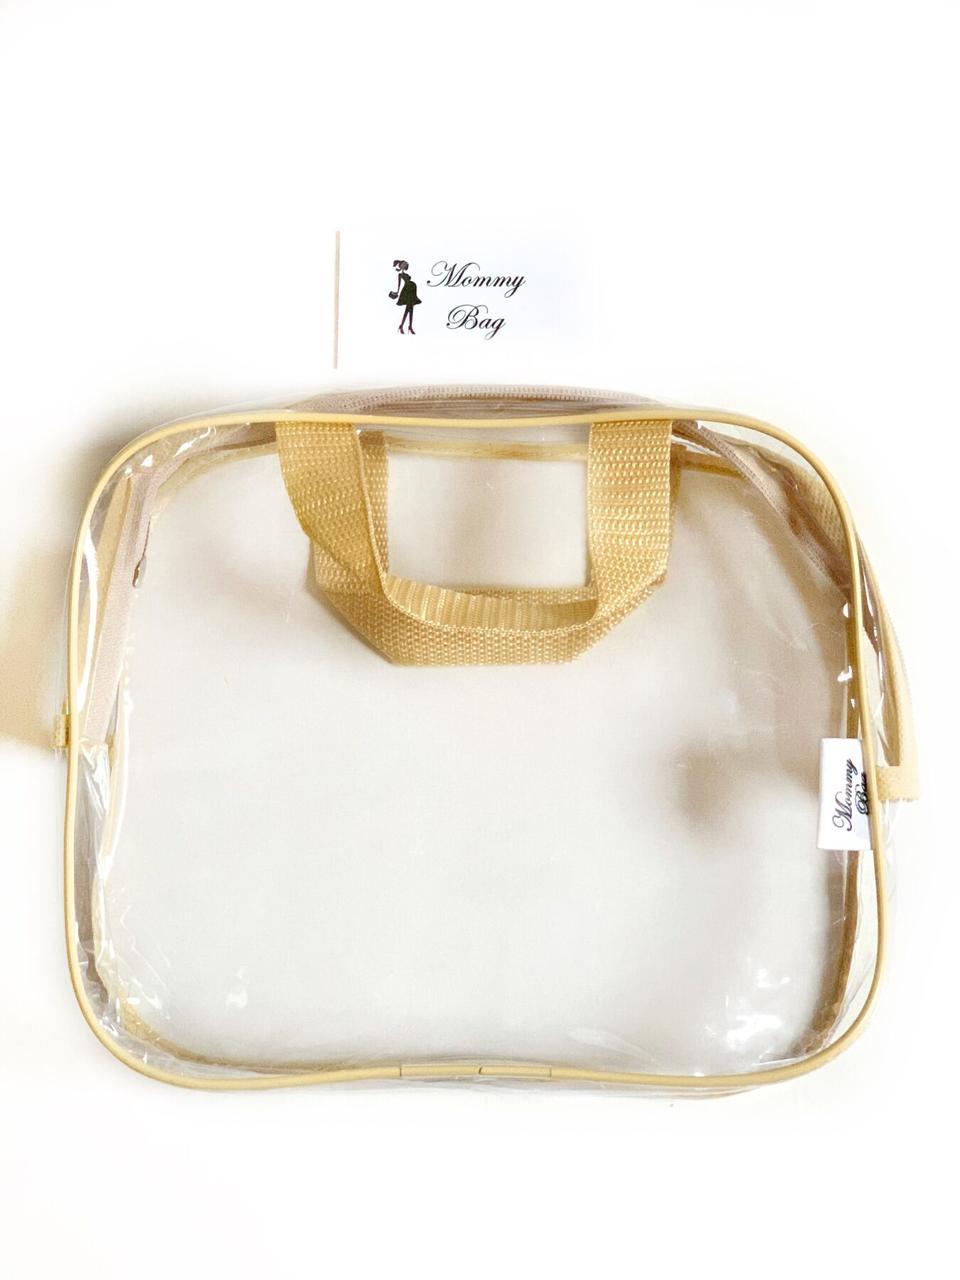 Косметичка Макси прозрачная Mommy Bag, цвет - Бежевый